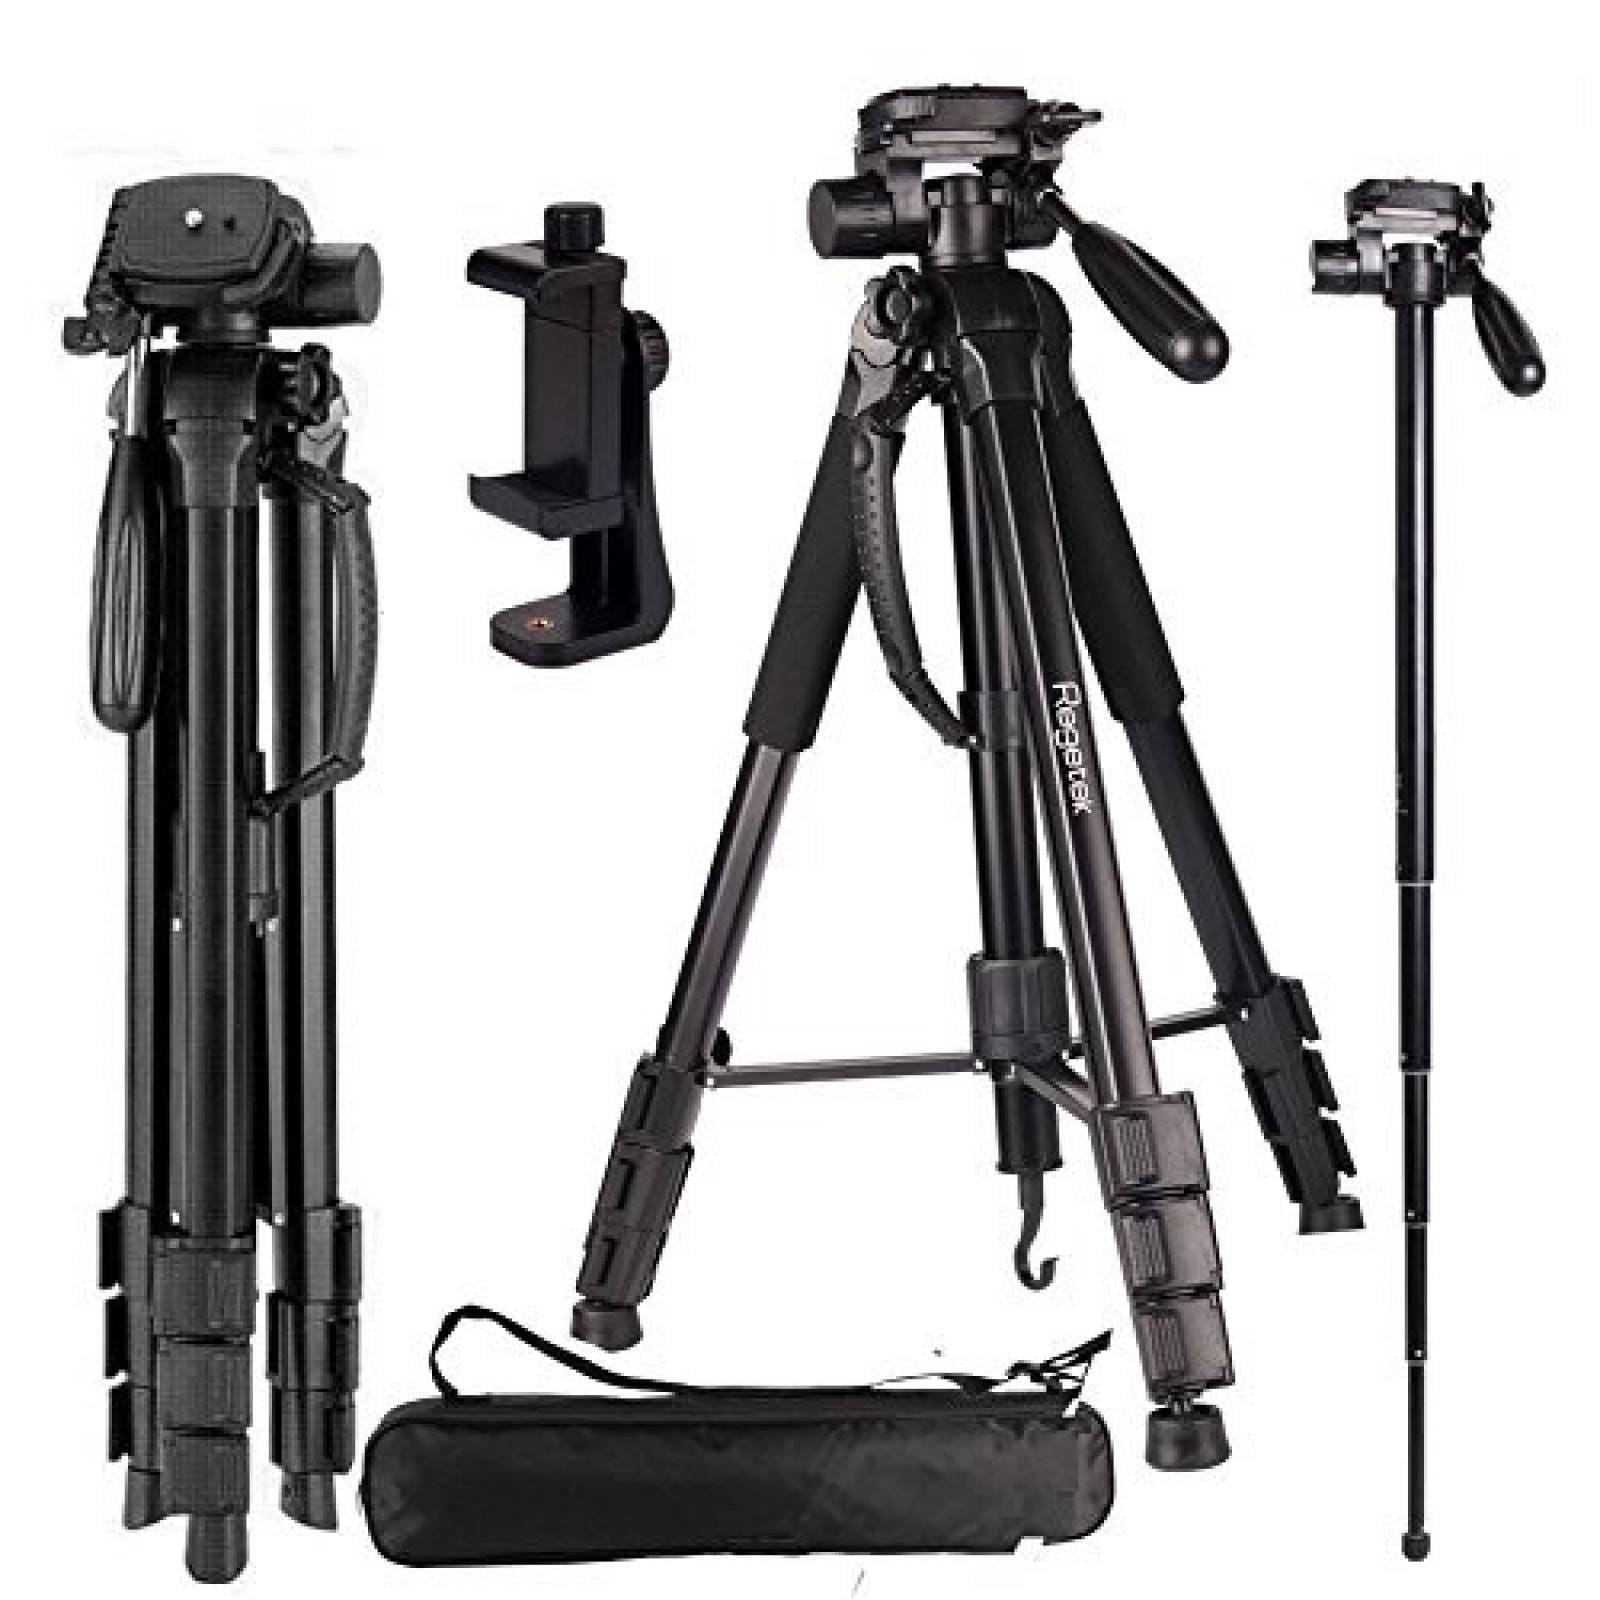 Trípode de viaje para cámara de vídeo Regetek Aluminio